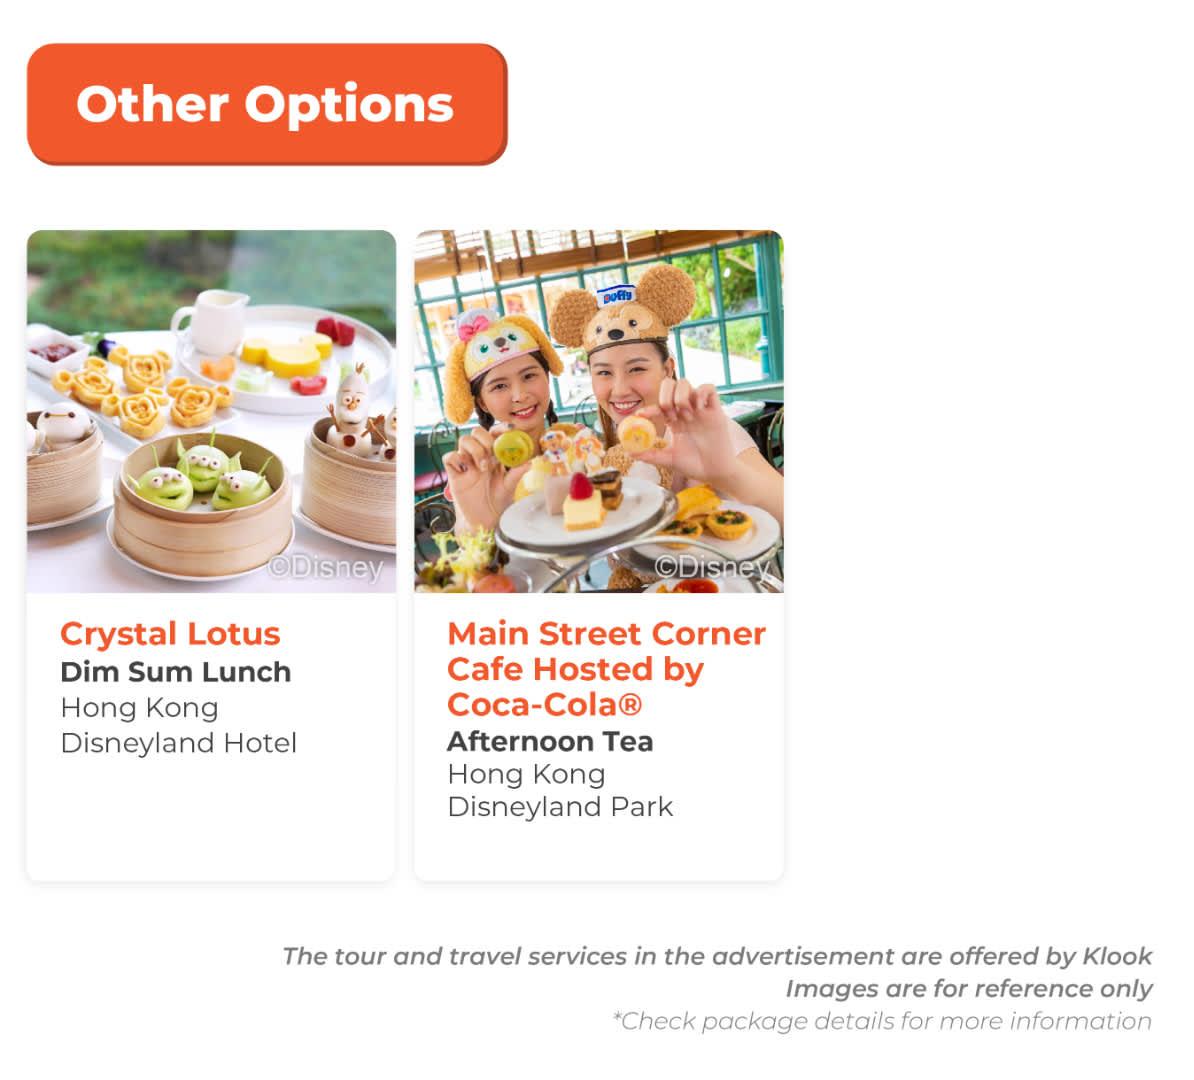 Hong kong Disneyland other food options